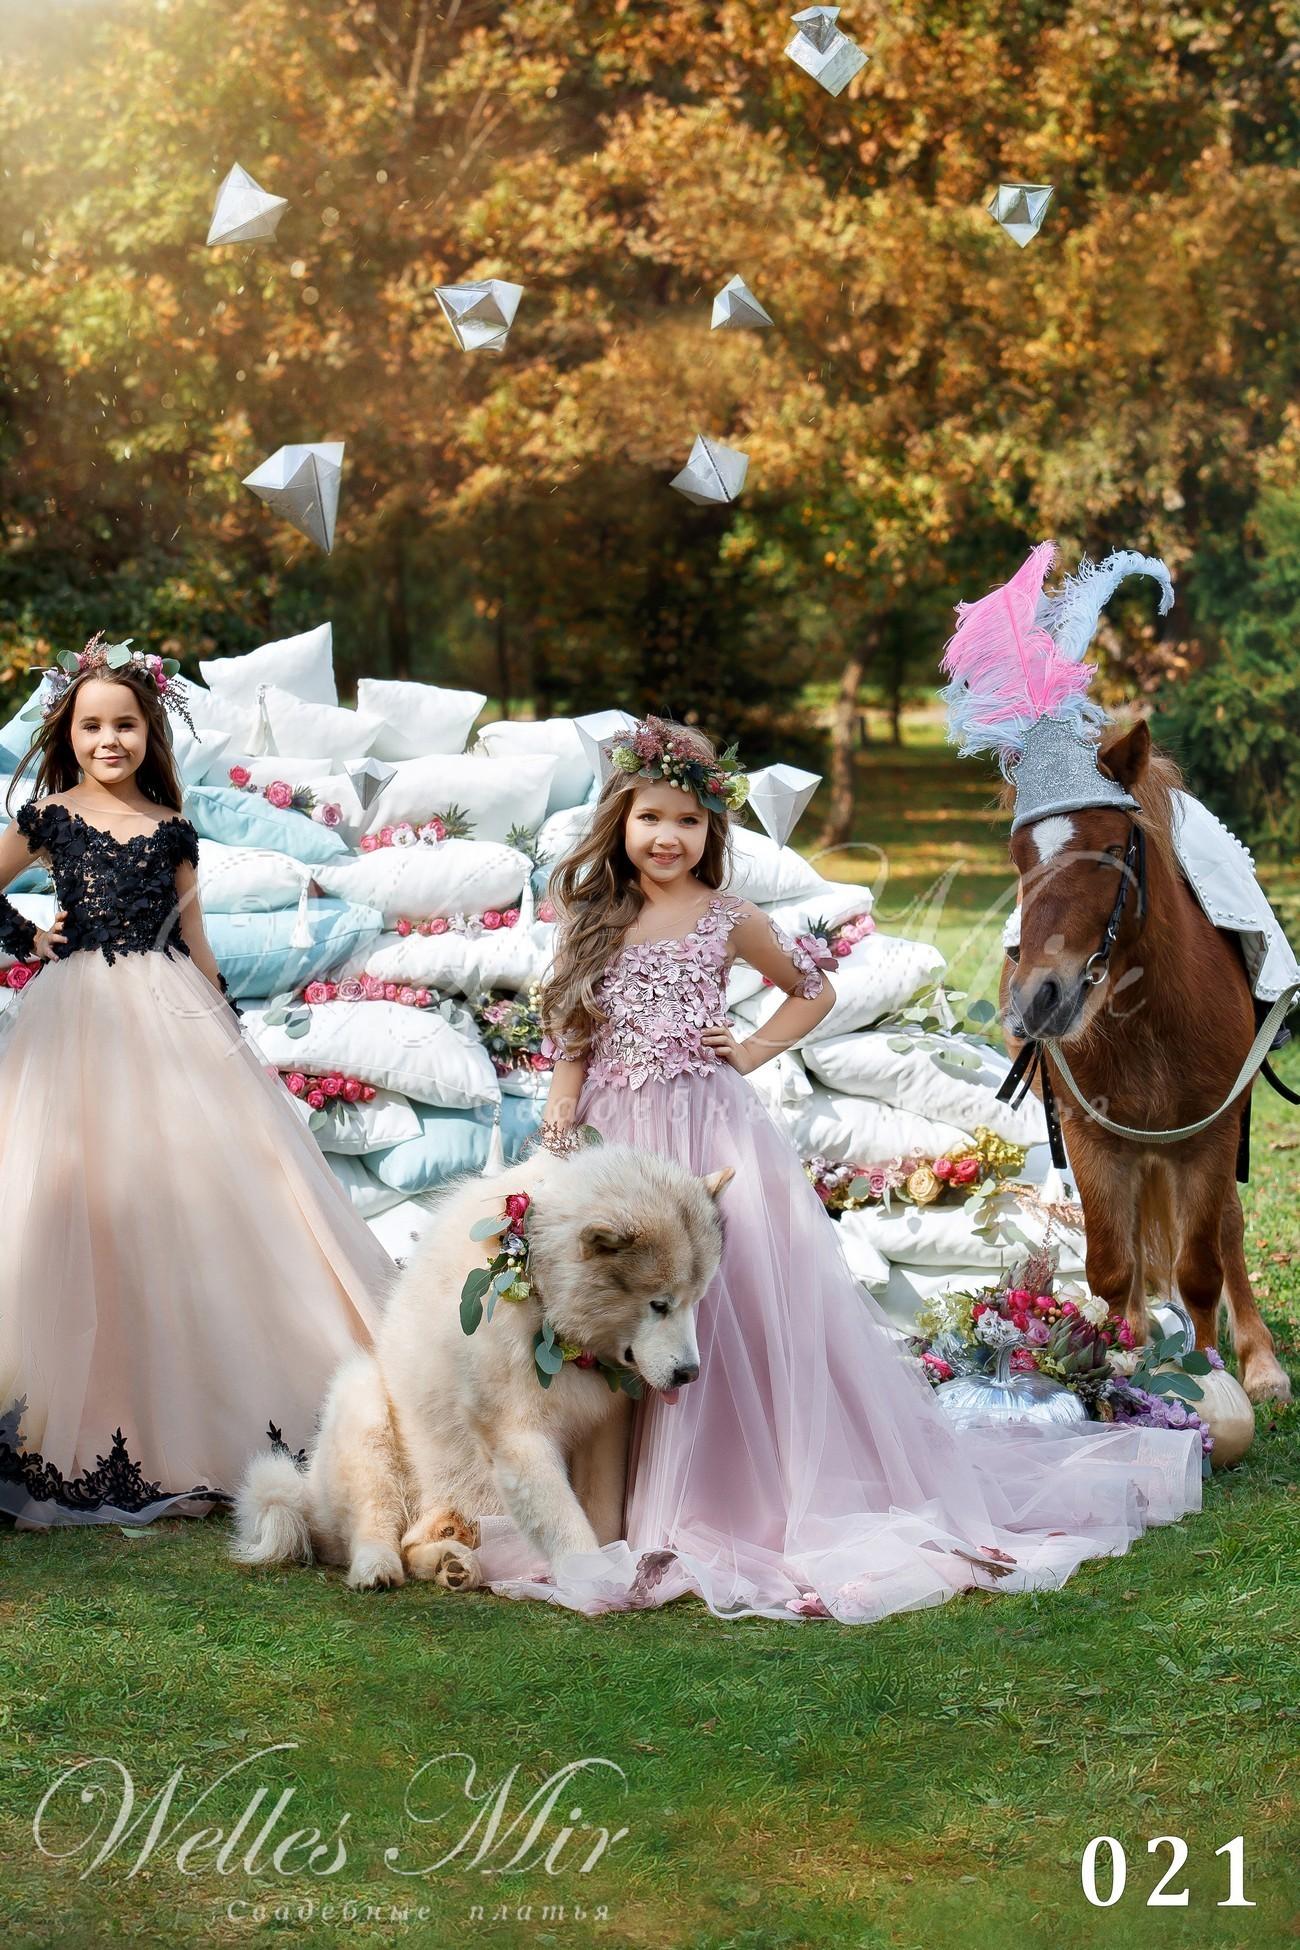 Детские платья Kids Deluxe Collection 2018 - 021